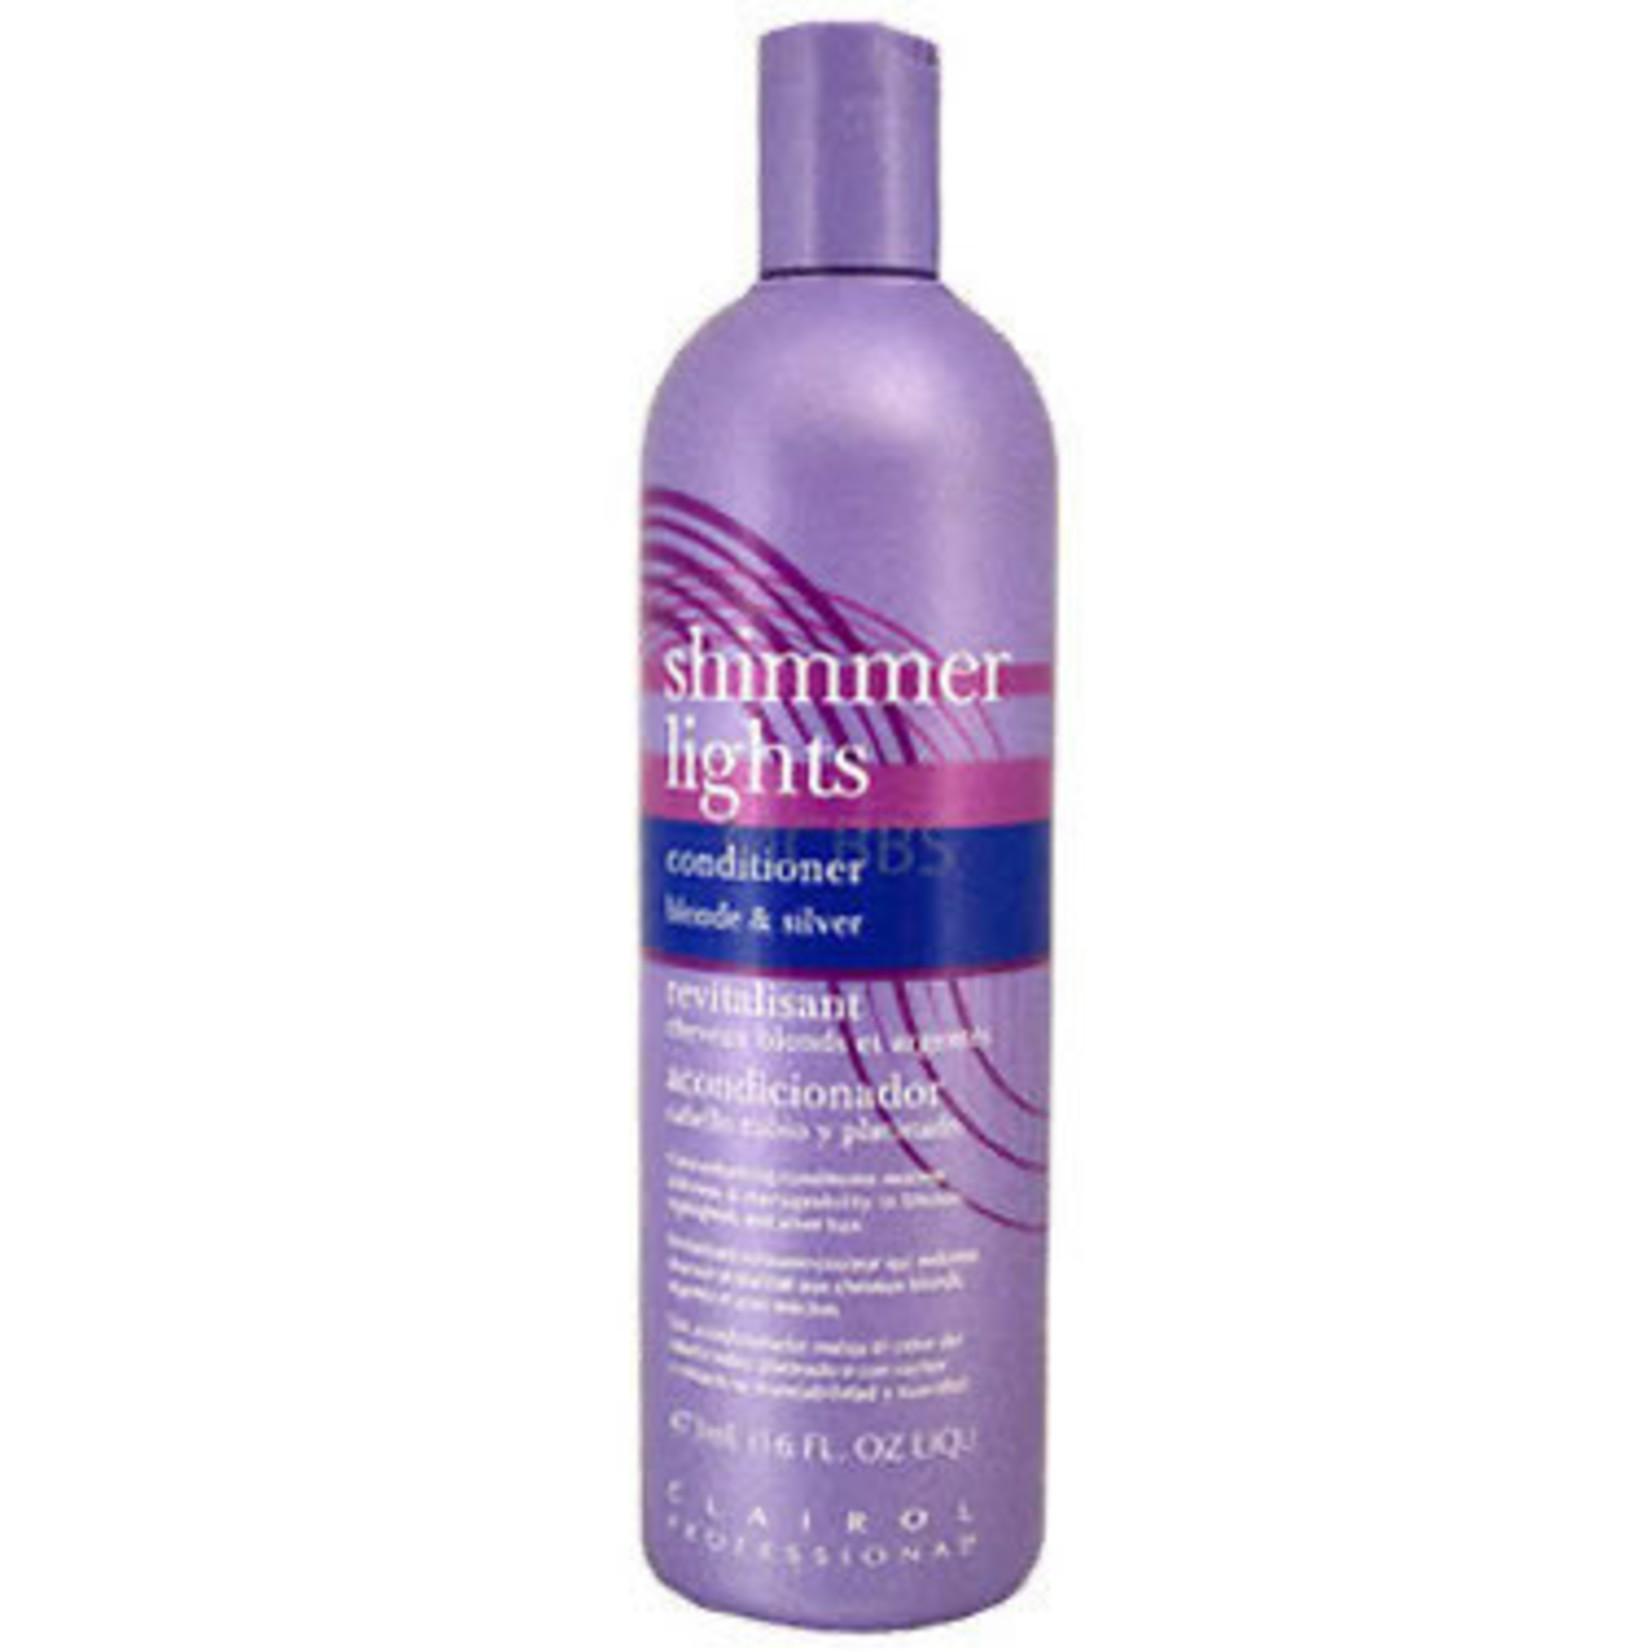 SHIMMER LIGHTS SHIMMER LIGHTS CONDITIONER [16OZ / 473mL]